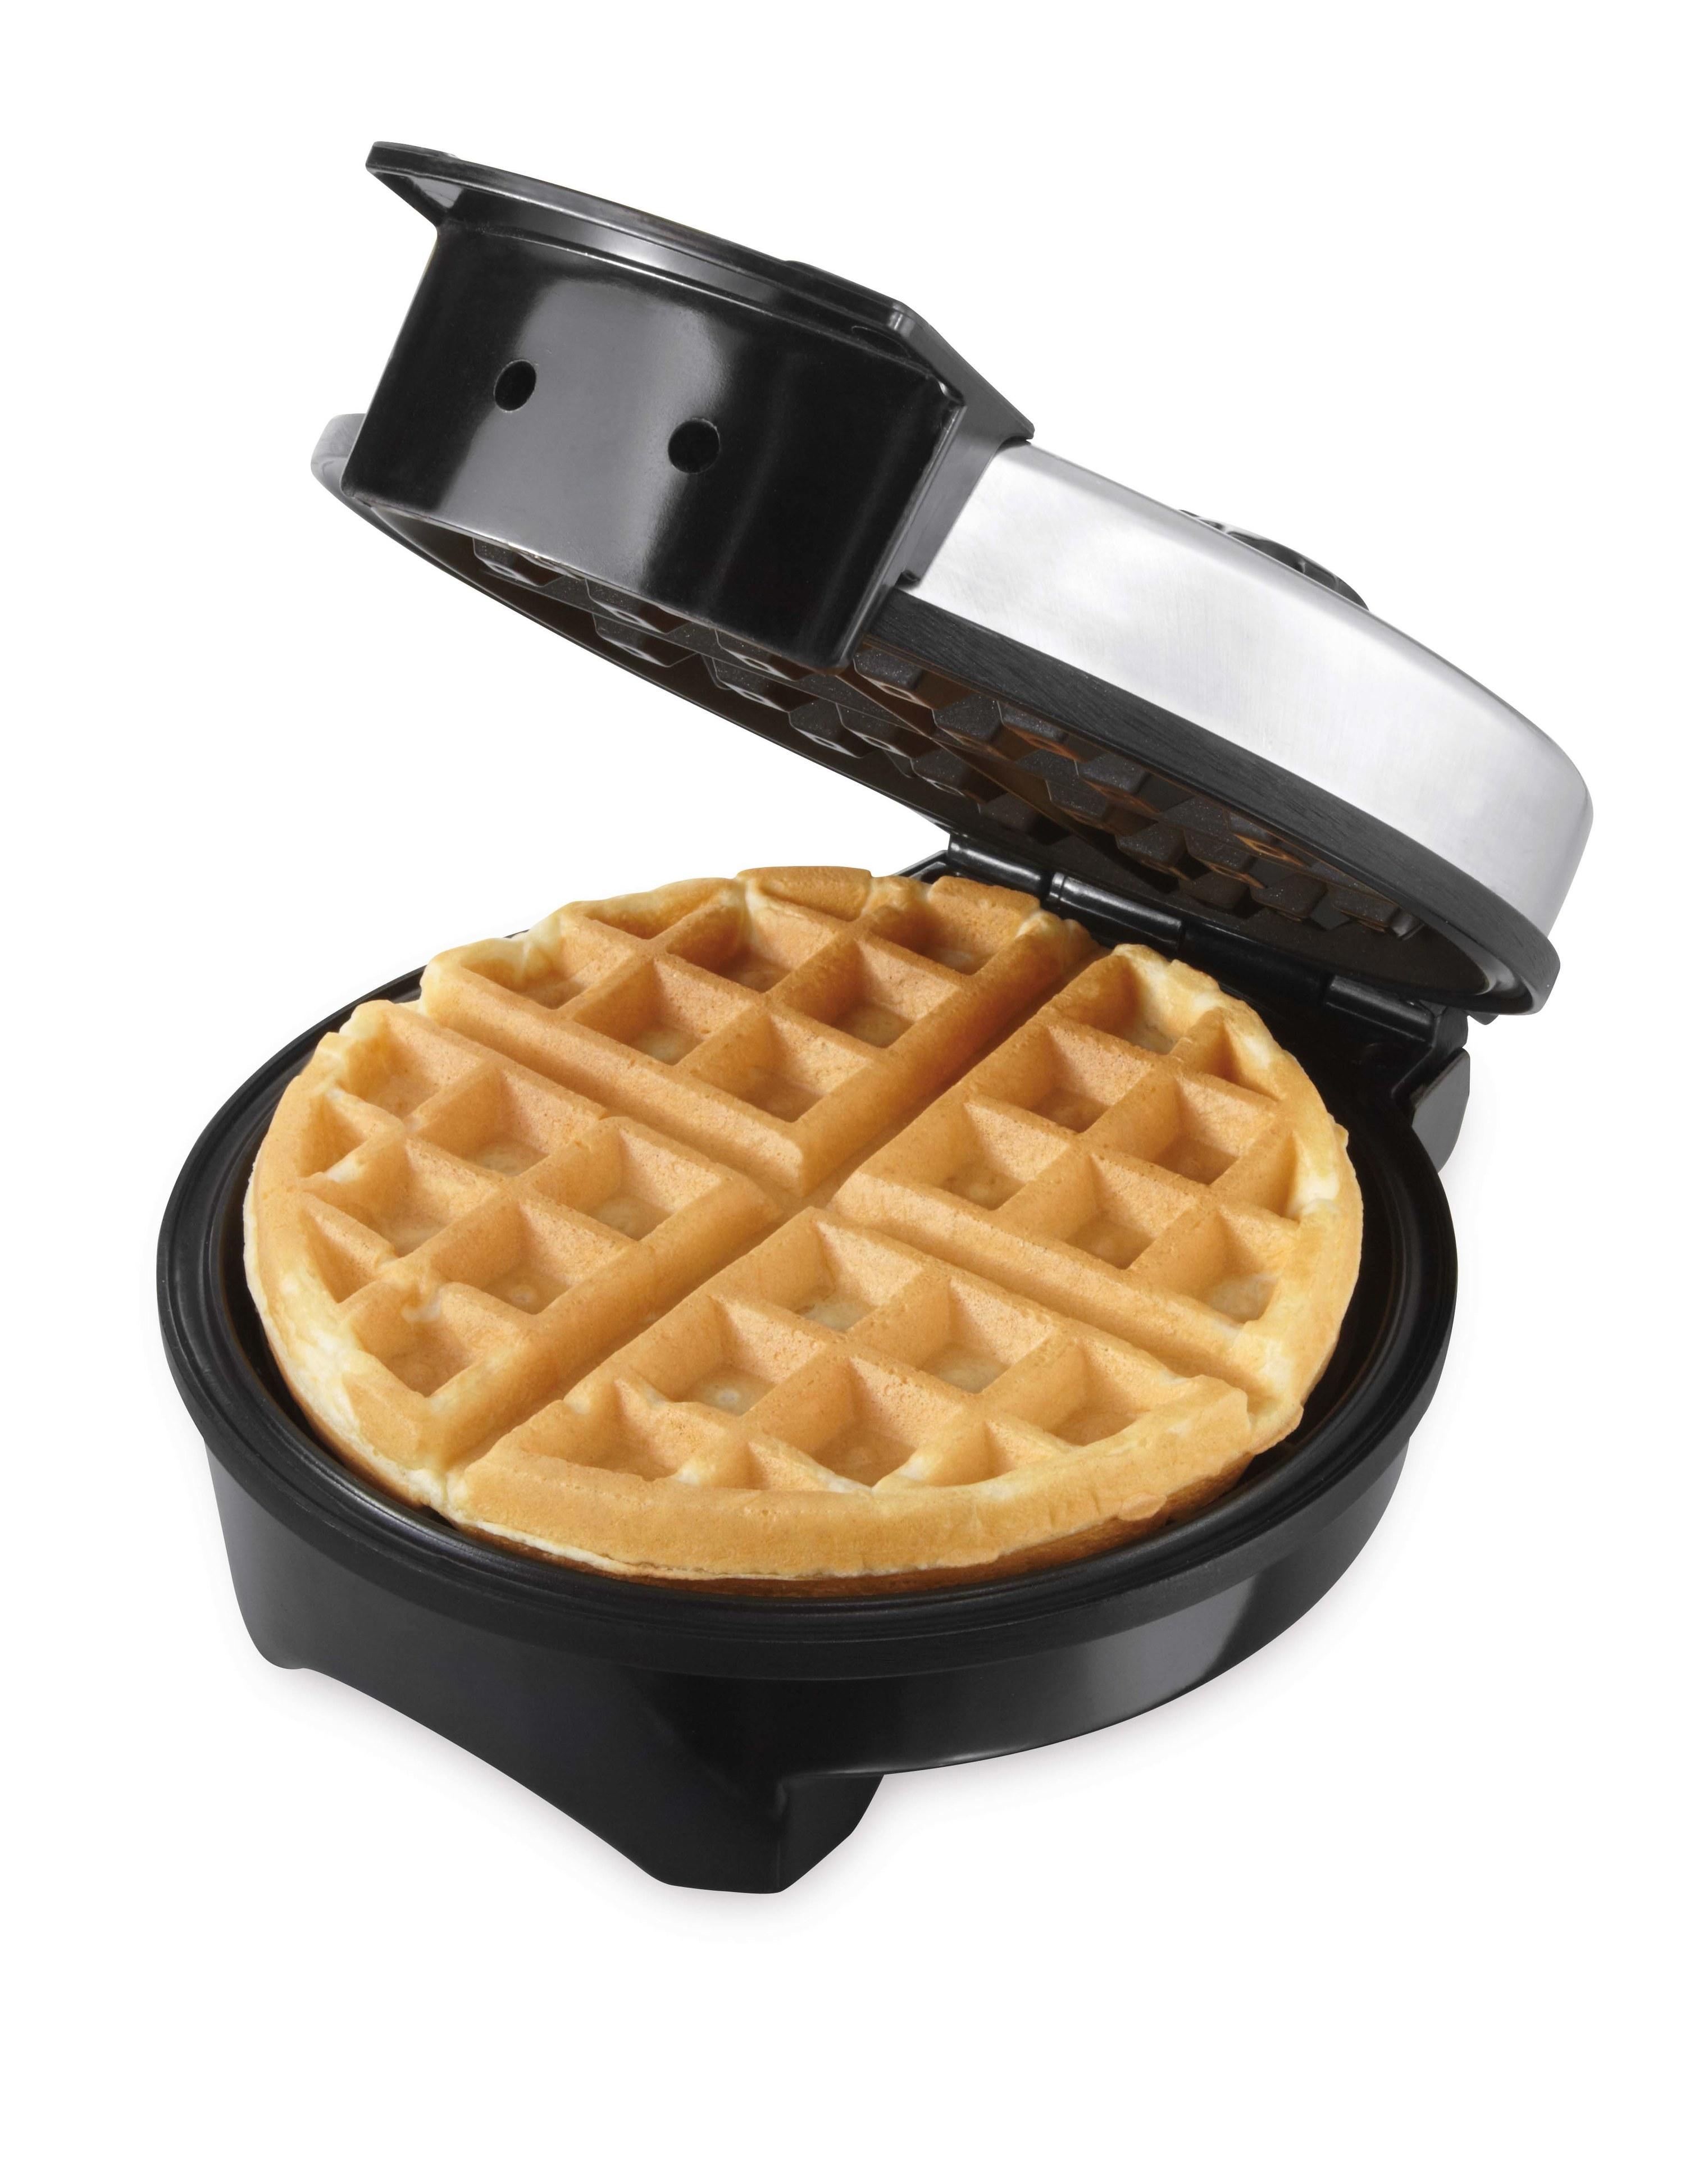 A non-stick belgian waffle maker